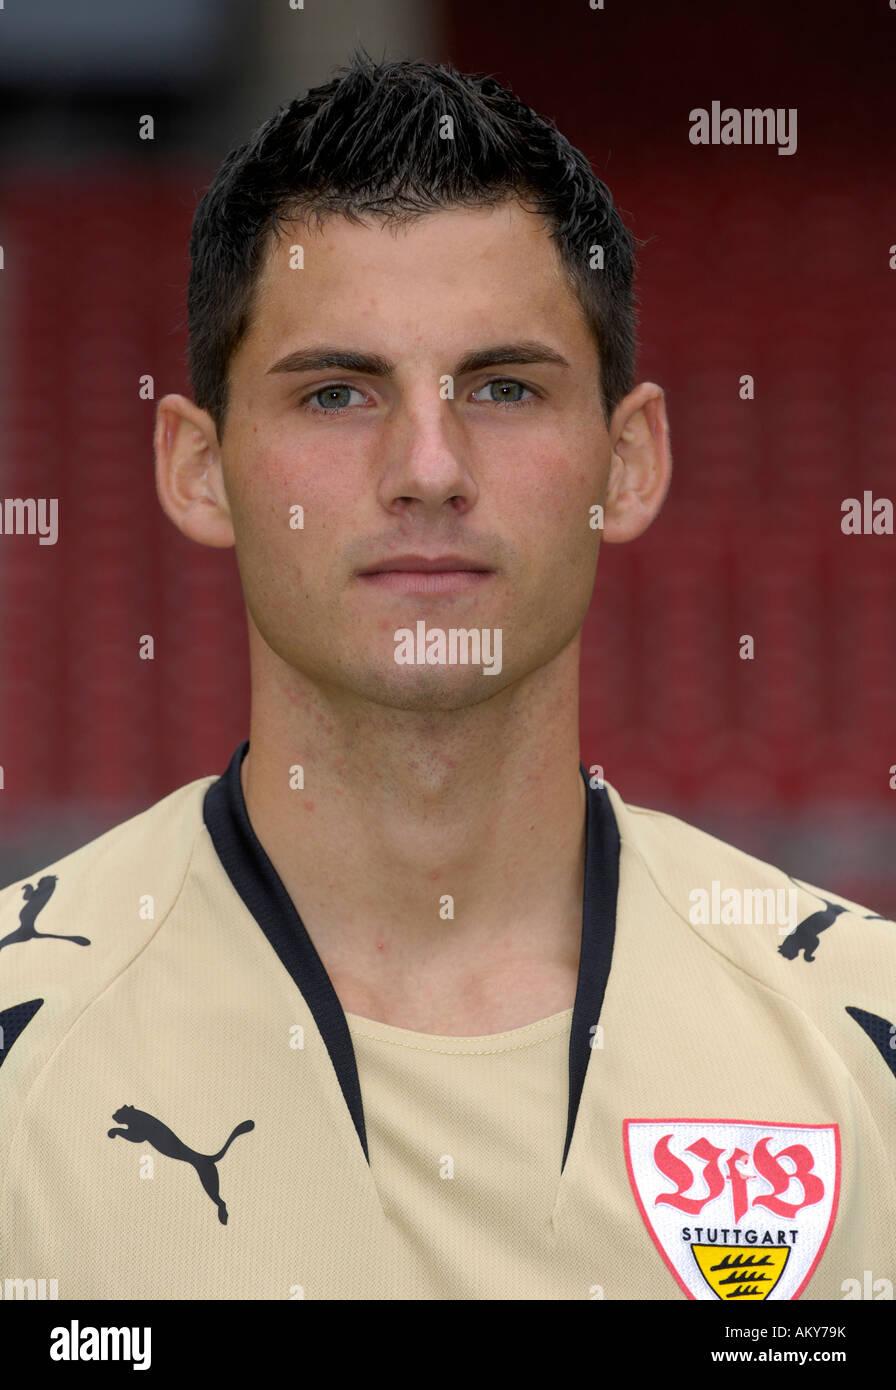 Goalkeeper Alexander STOLZ VfB Stuttgart Stock Photo